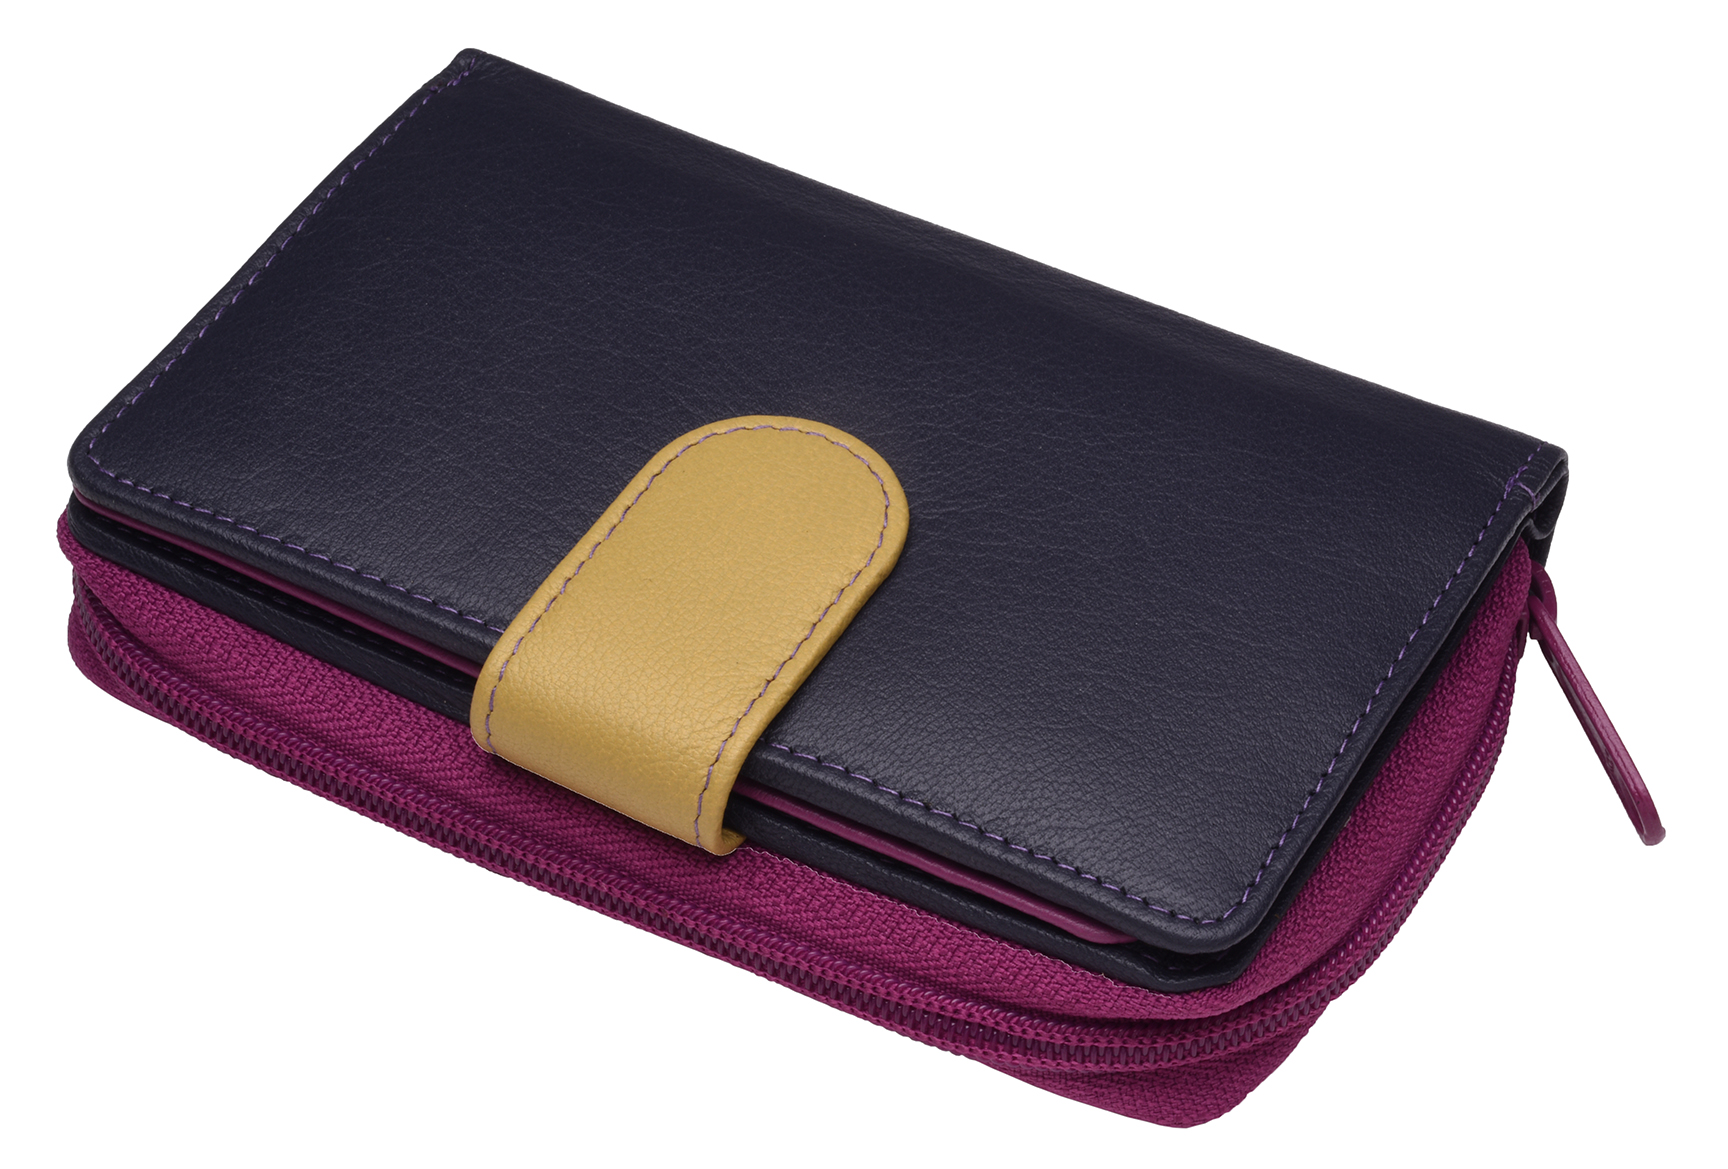 Ladies-Womens-RFID-Blocking-Safe-Leather-Bifold-Medium-Purse-Wallet-Coin-Section thumbnail 3